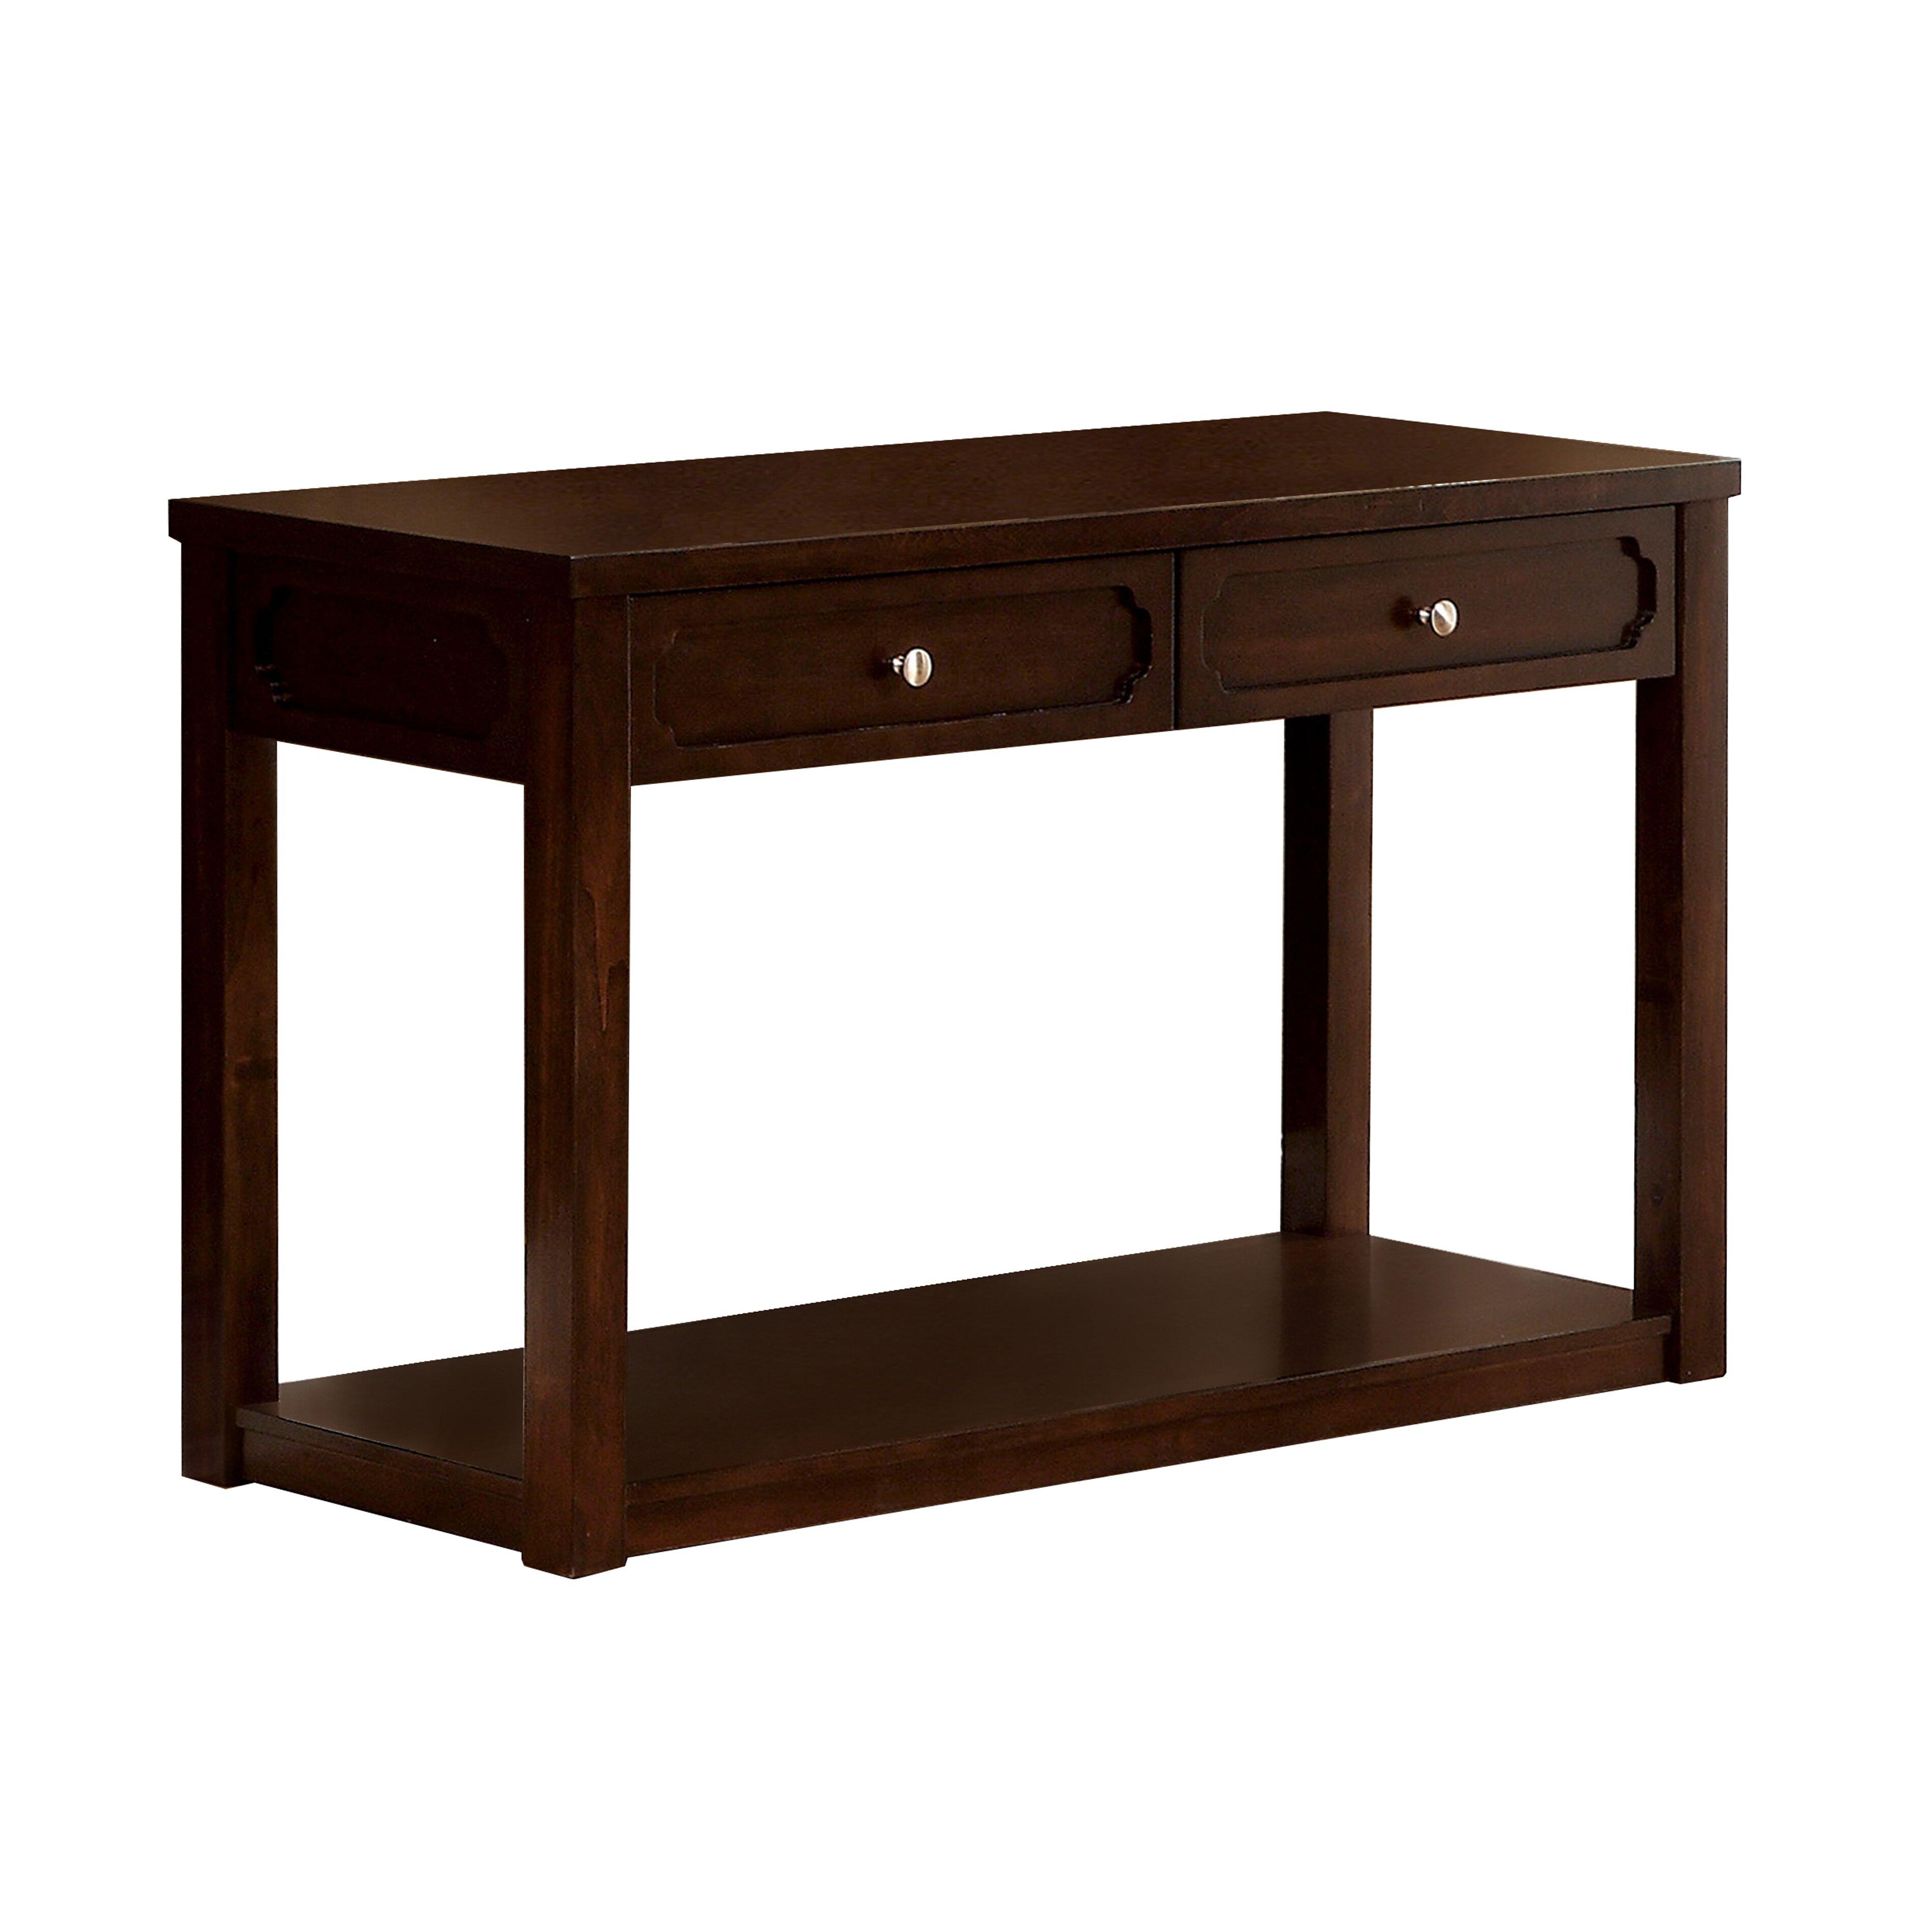 Hokku designs virotte console table reviews wayfair for Sofa table design ideas